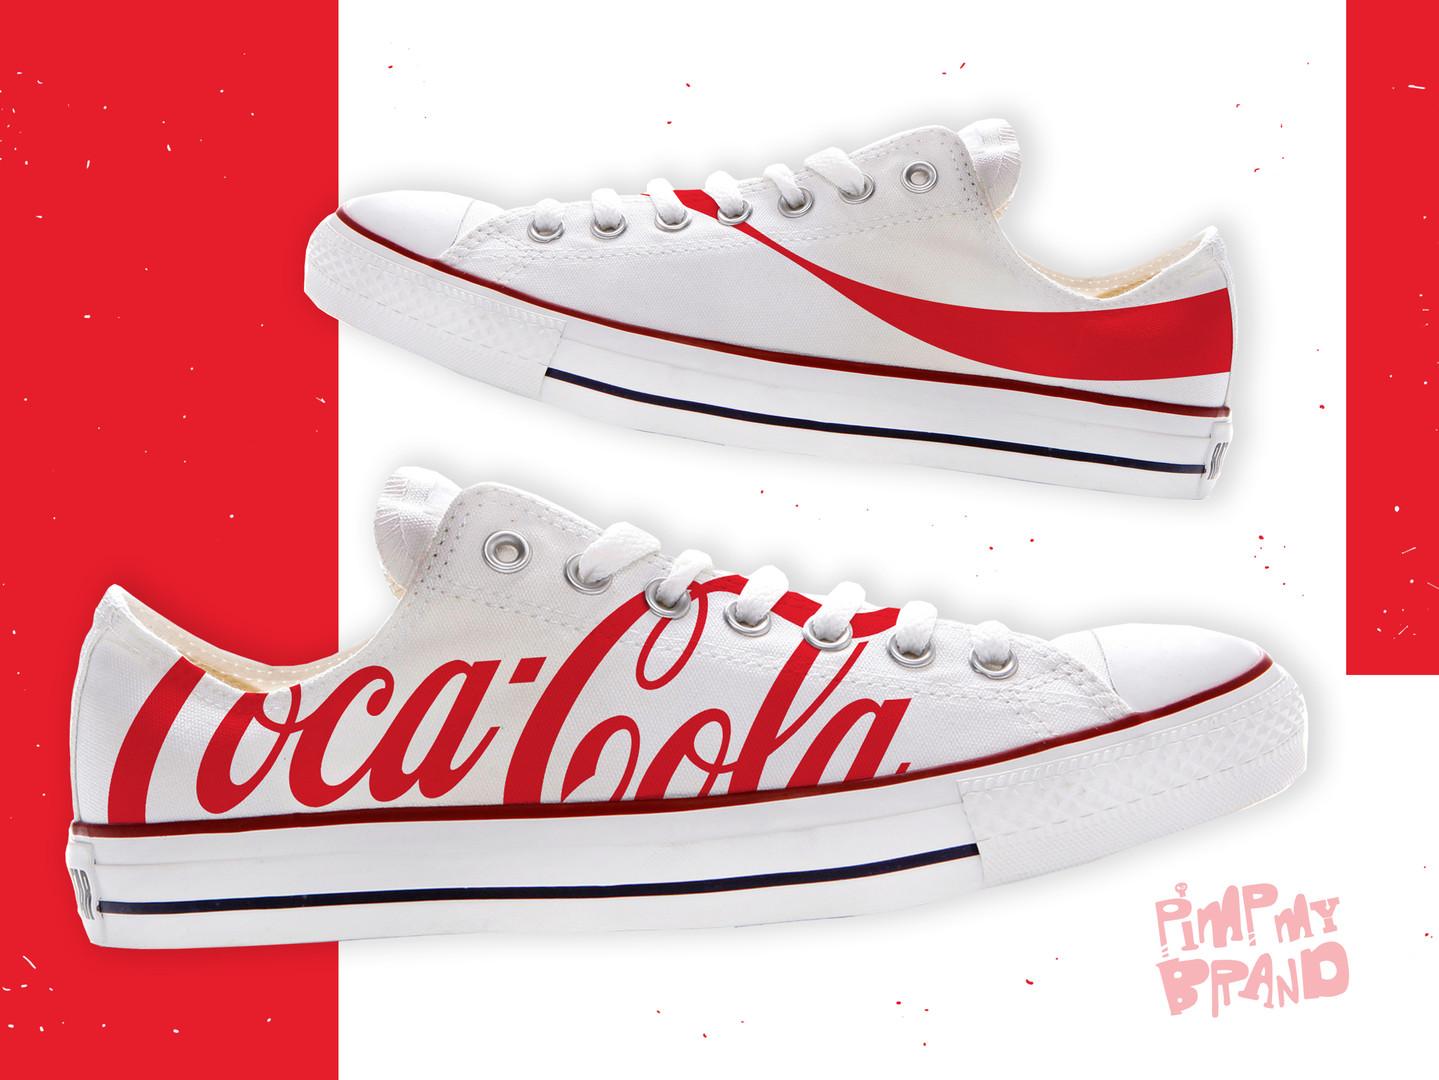 Coca-Cola printed kicks